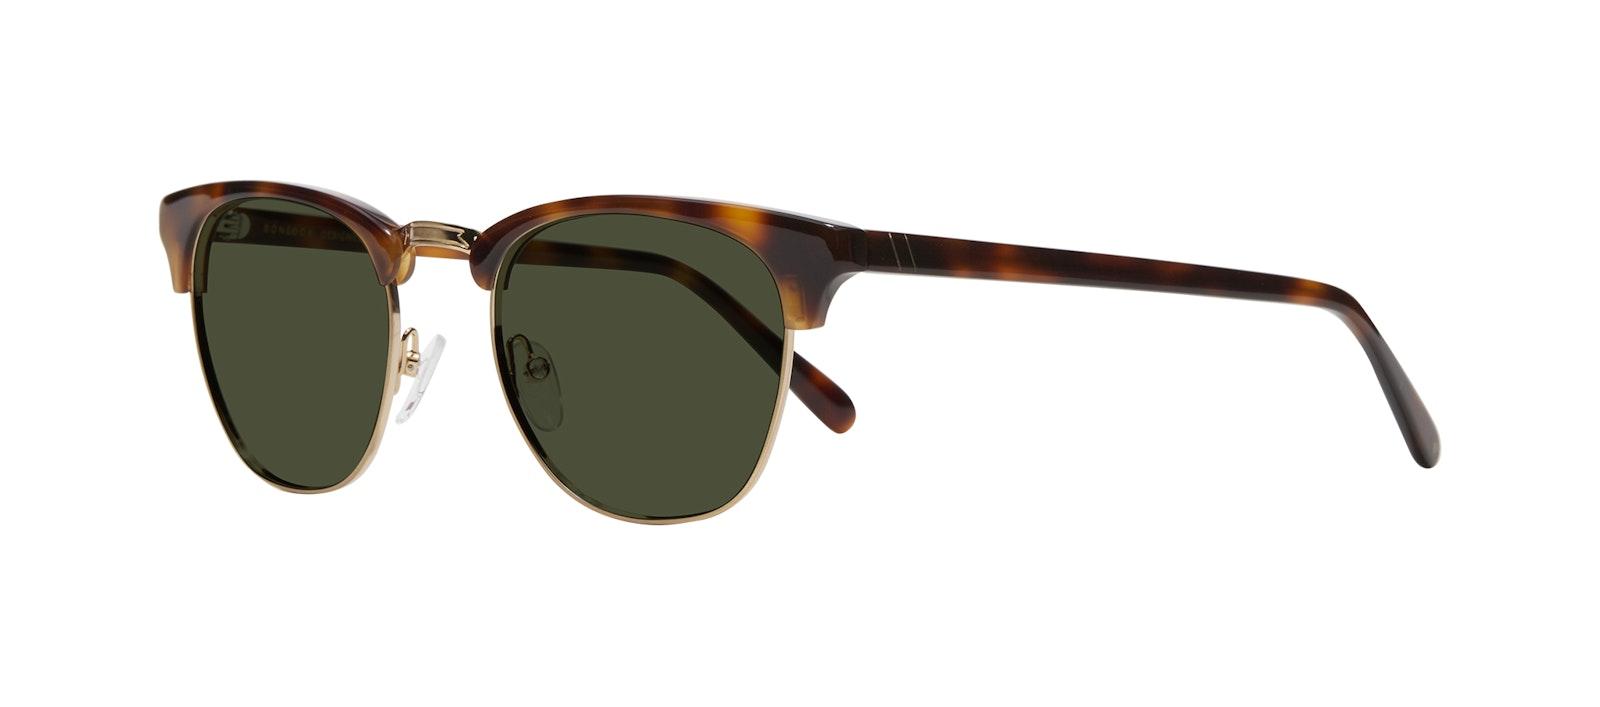 Affordable Fashion Glasses Square Sunglasses Men Always Tortoise Tilt